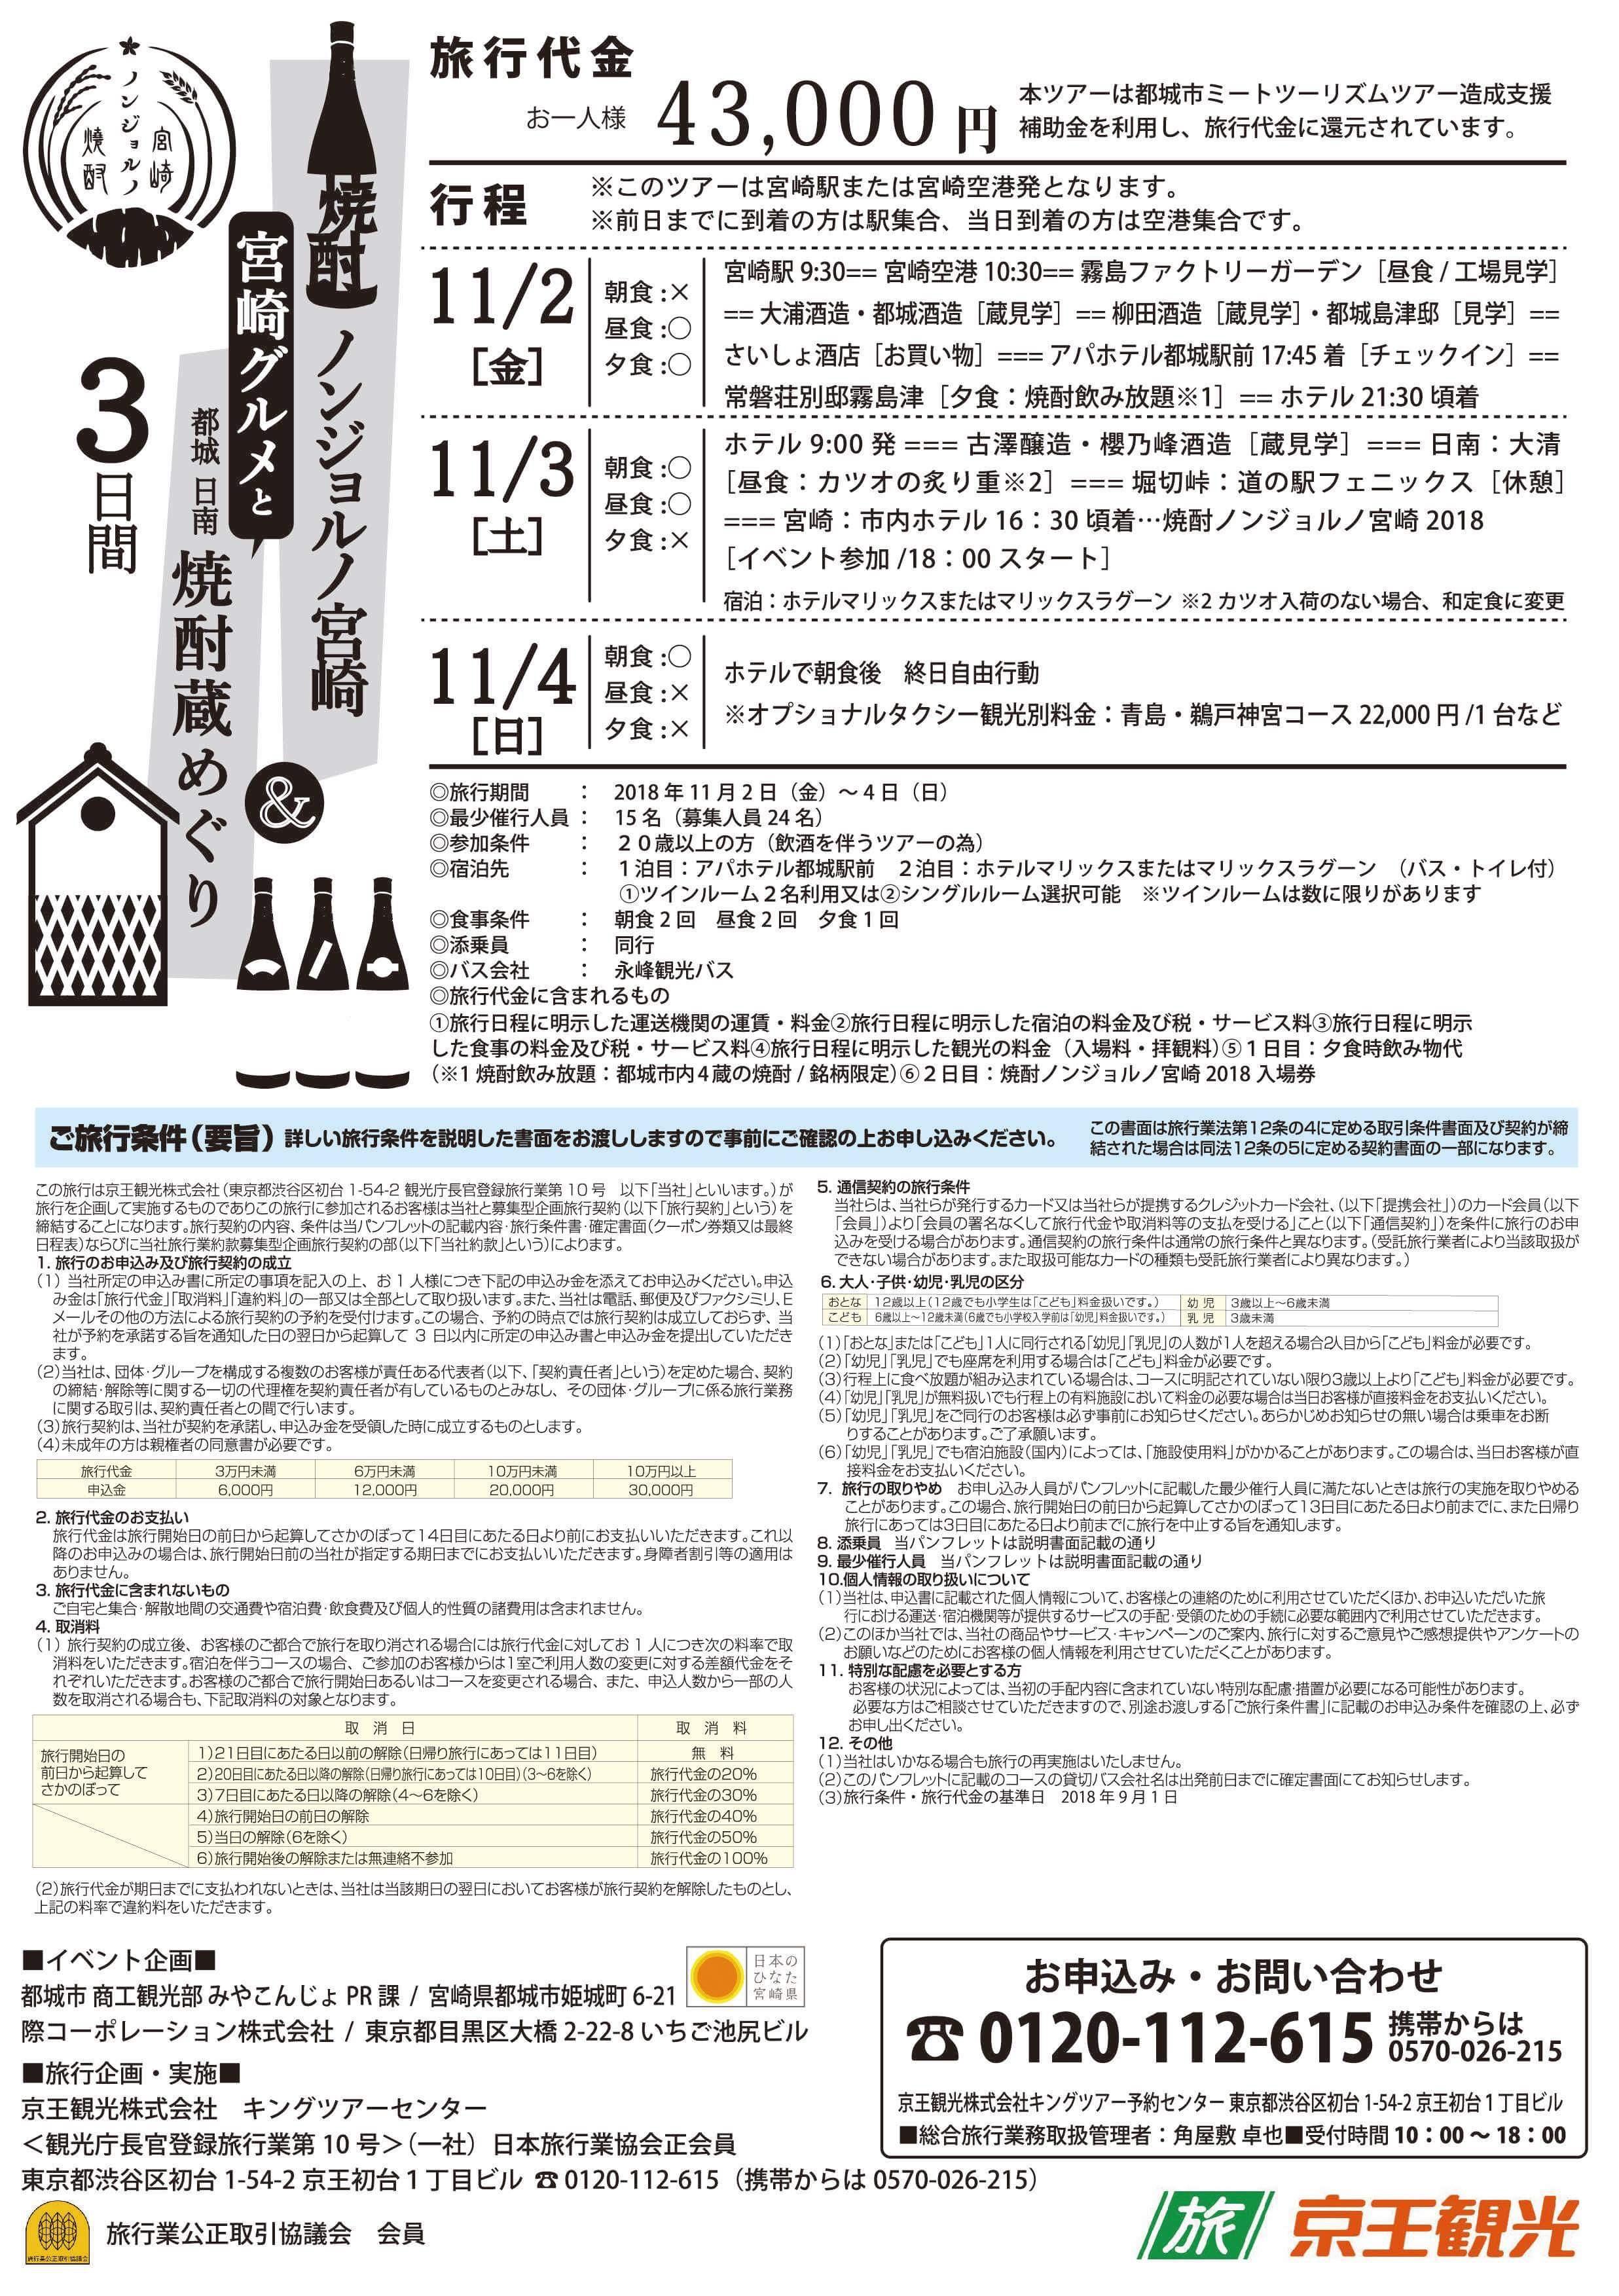 B53564CE-A35E-403D-B5B4-B0CFE298420D